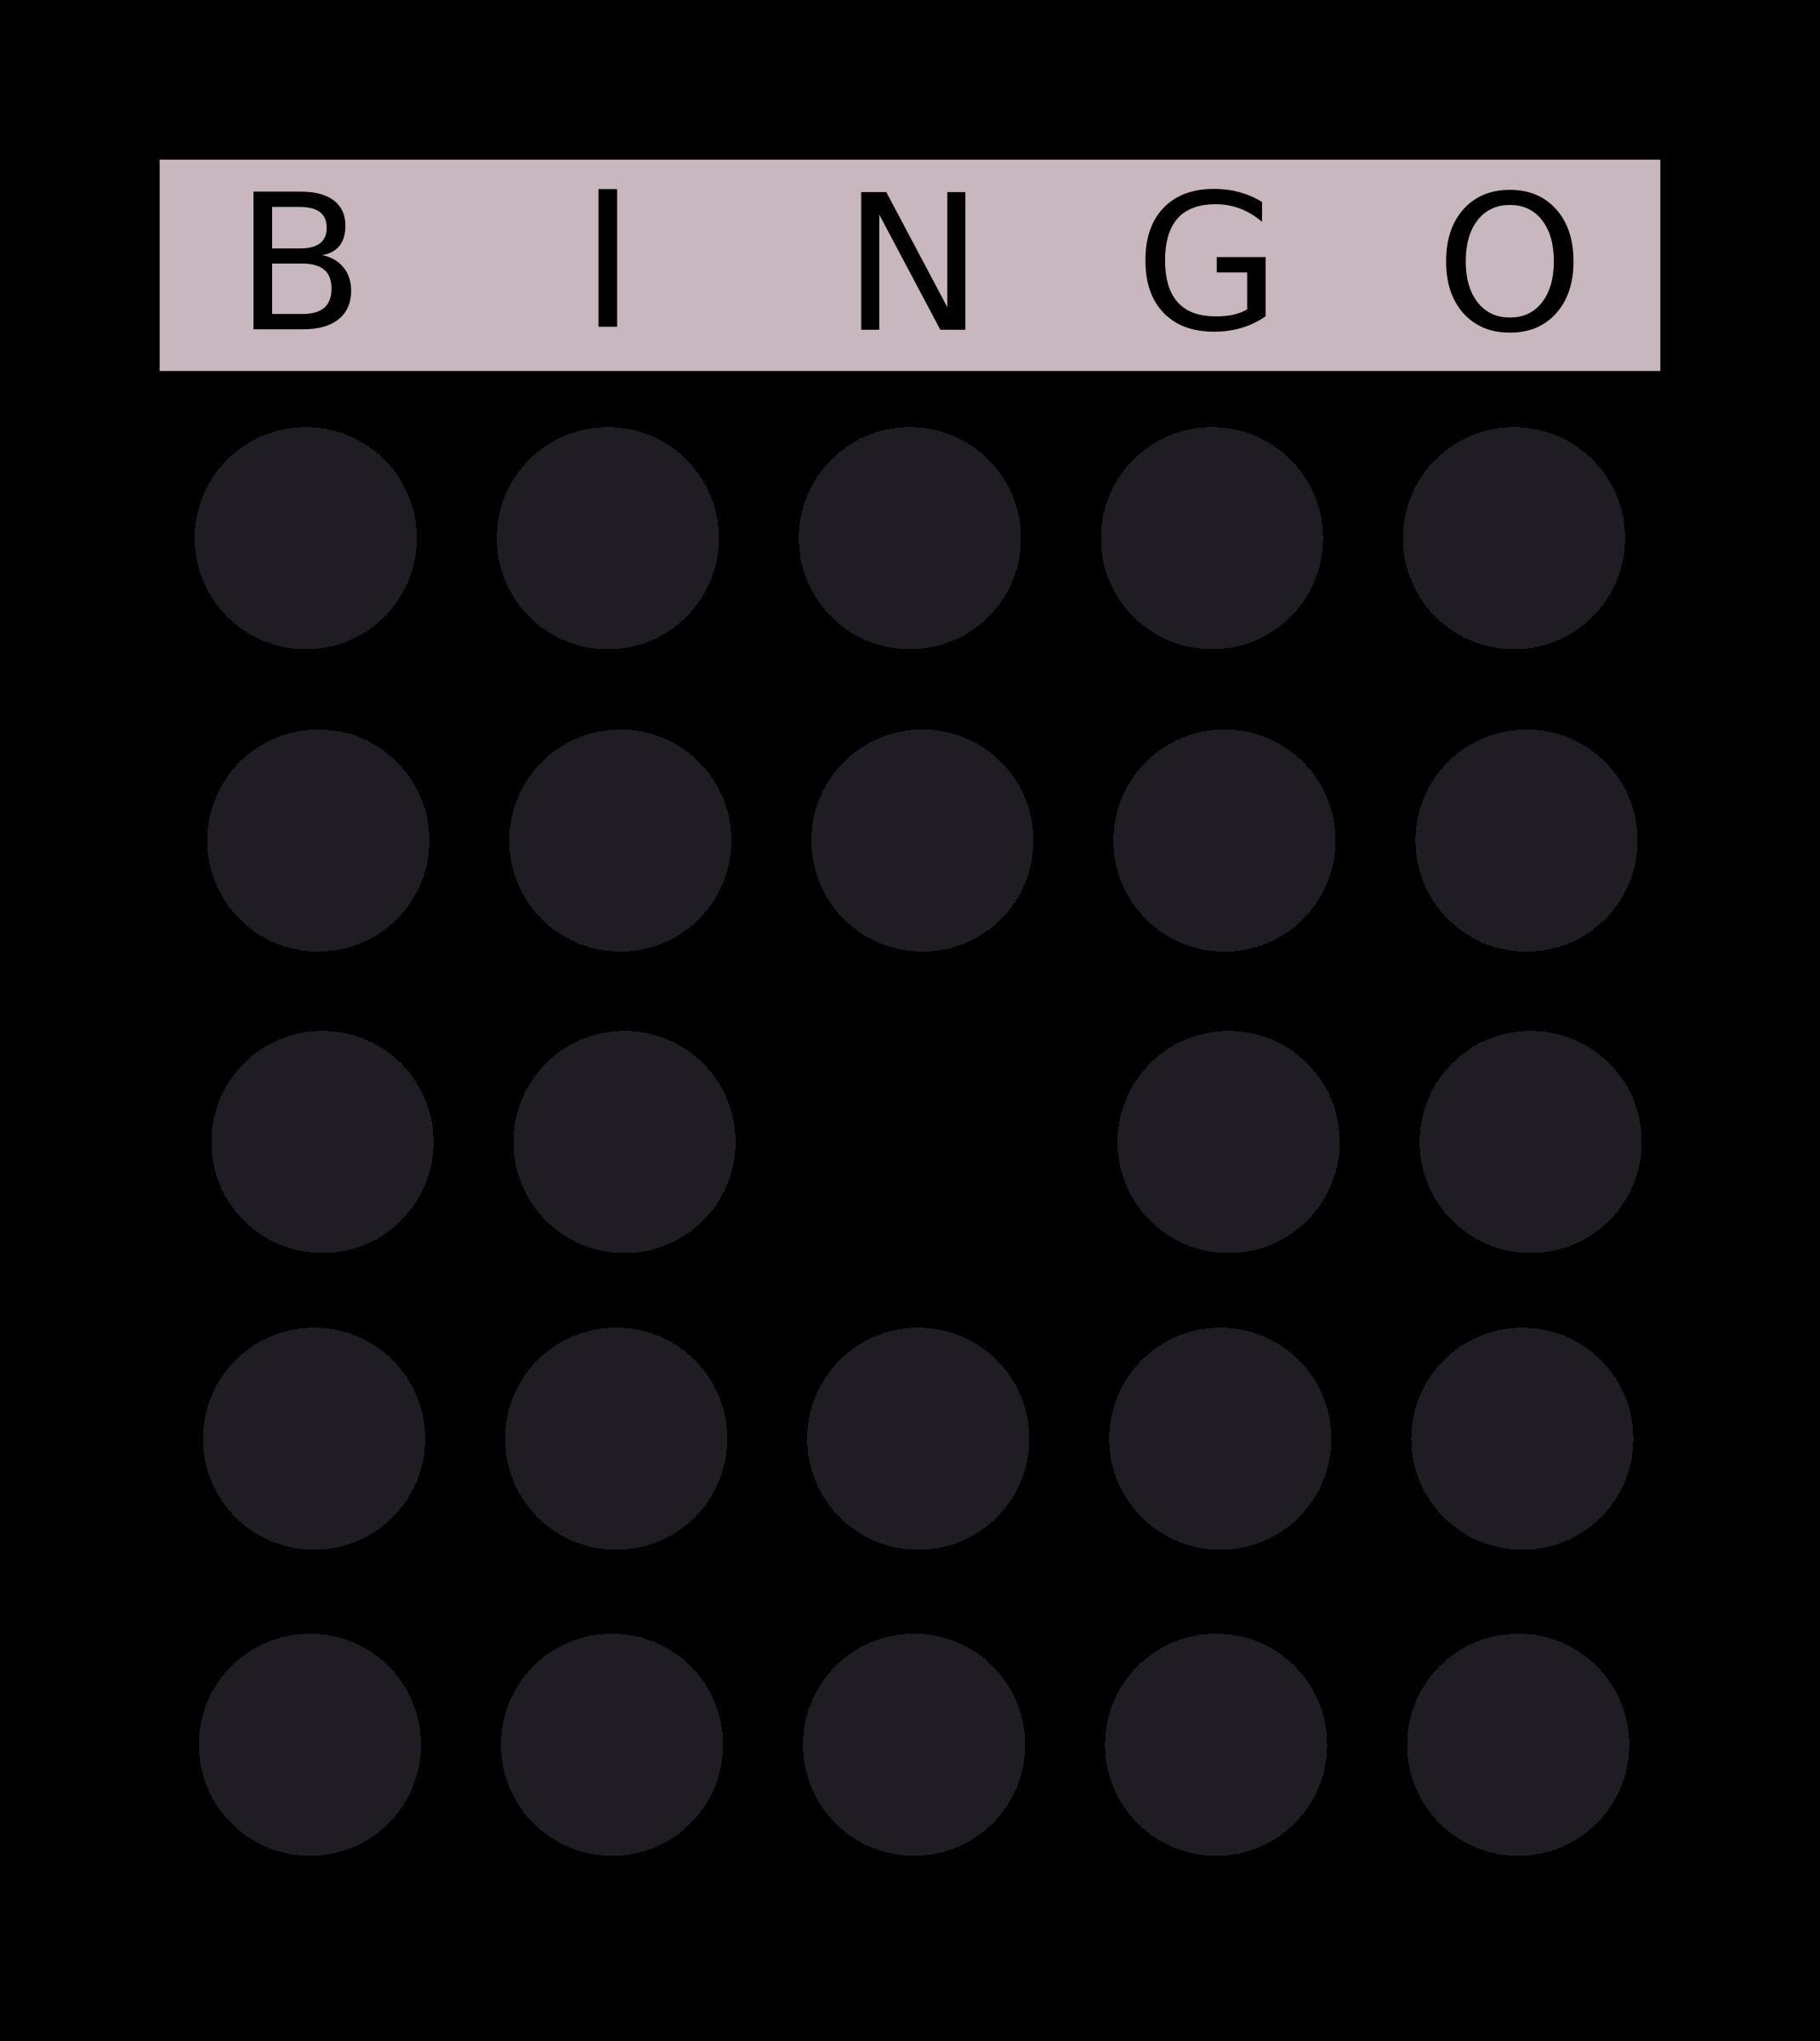 png transparent download Bingo clipart. Card big image png